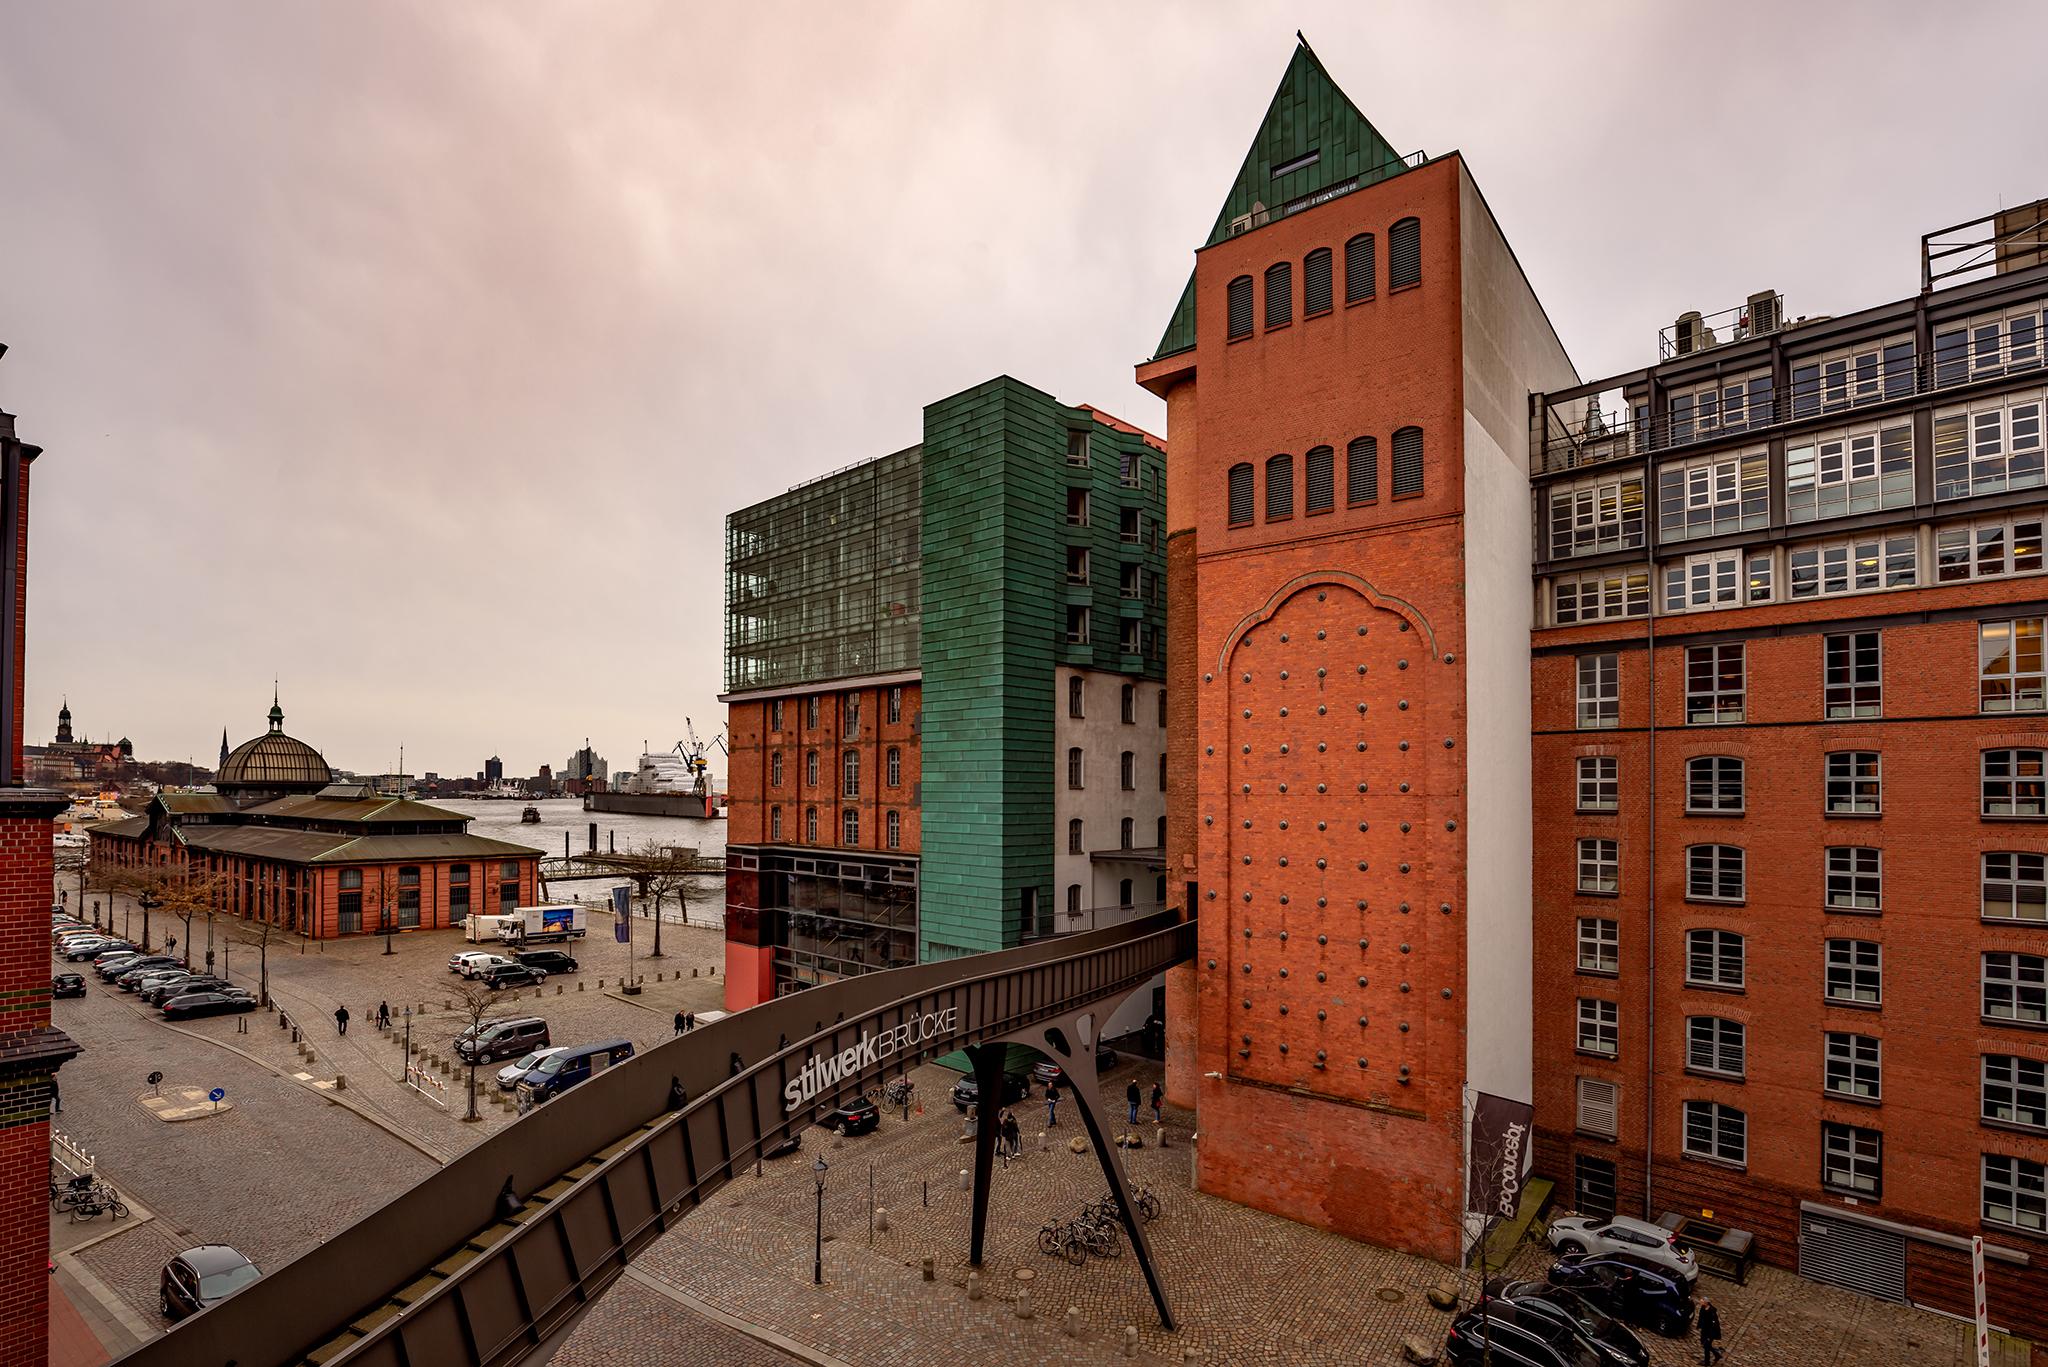 Stilwerkbrücke, Germany